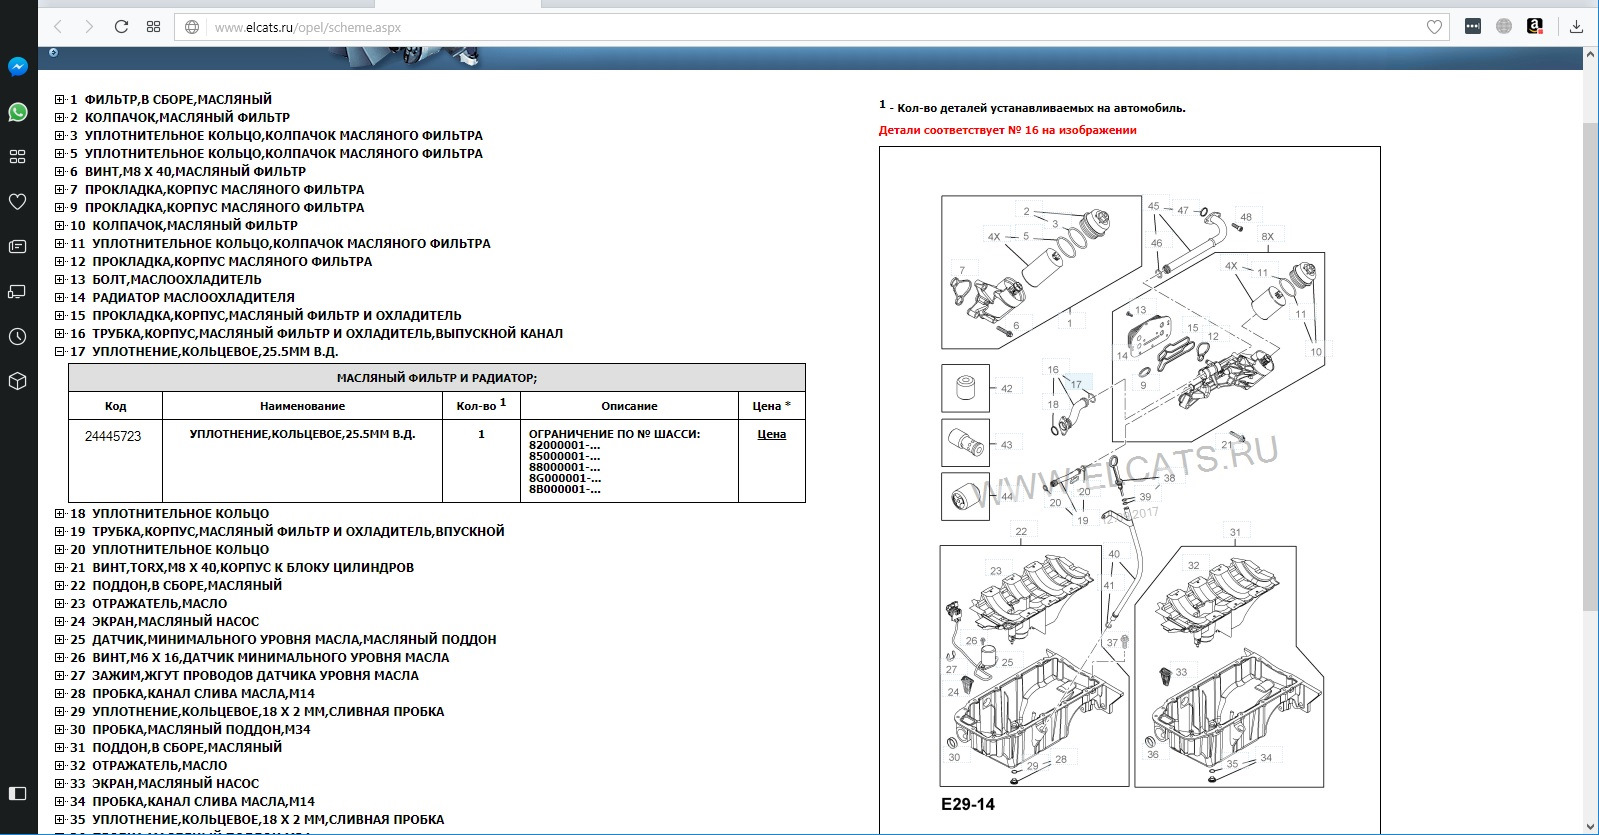 Тер установка теплообменника Пластины теплообменника Sondex S17 Набережные Челны